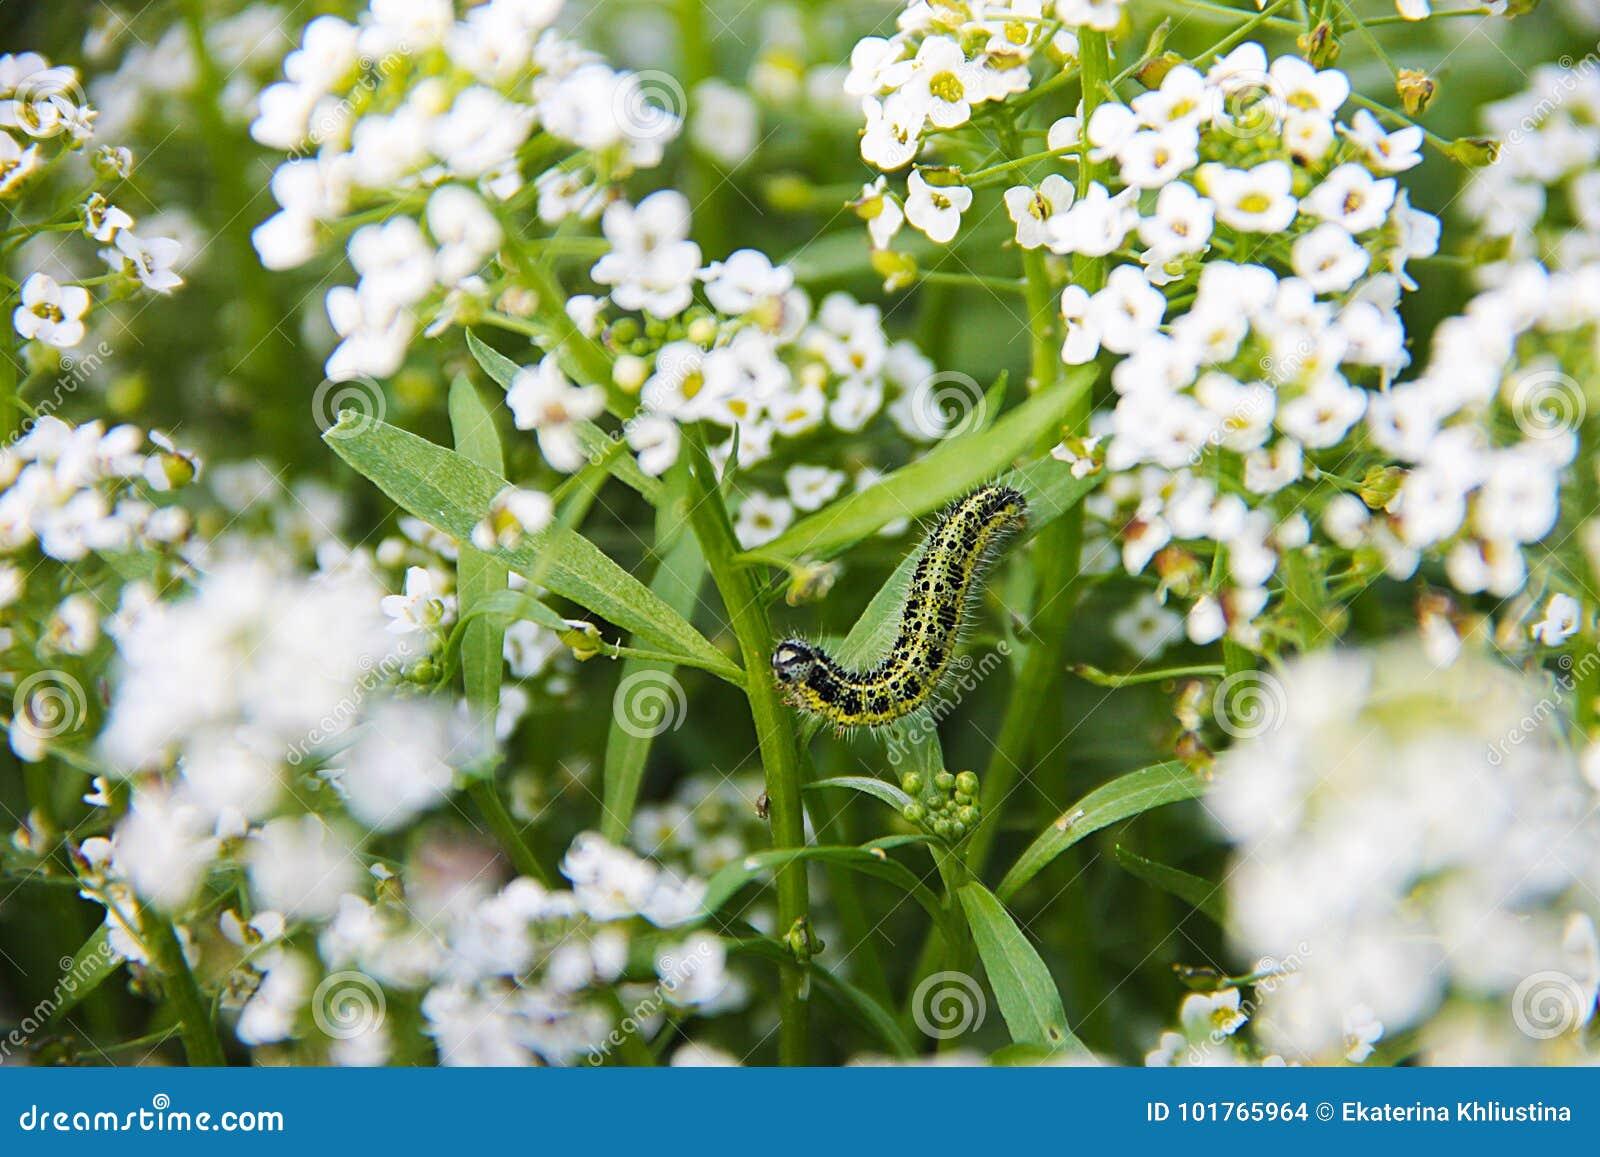 Carpet Of Small White Fragrant Flowers Alissum Bright Summer